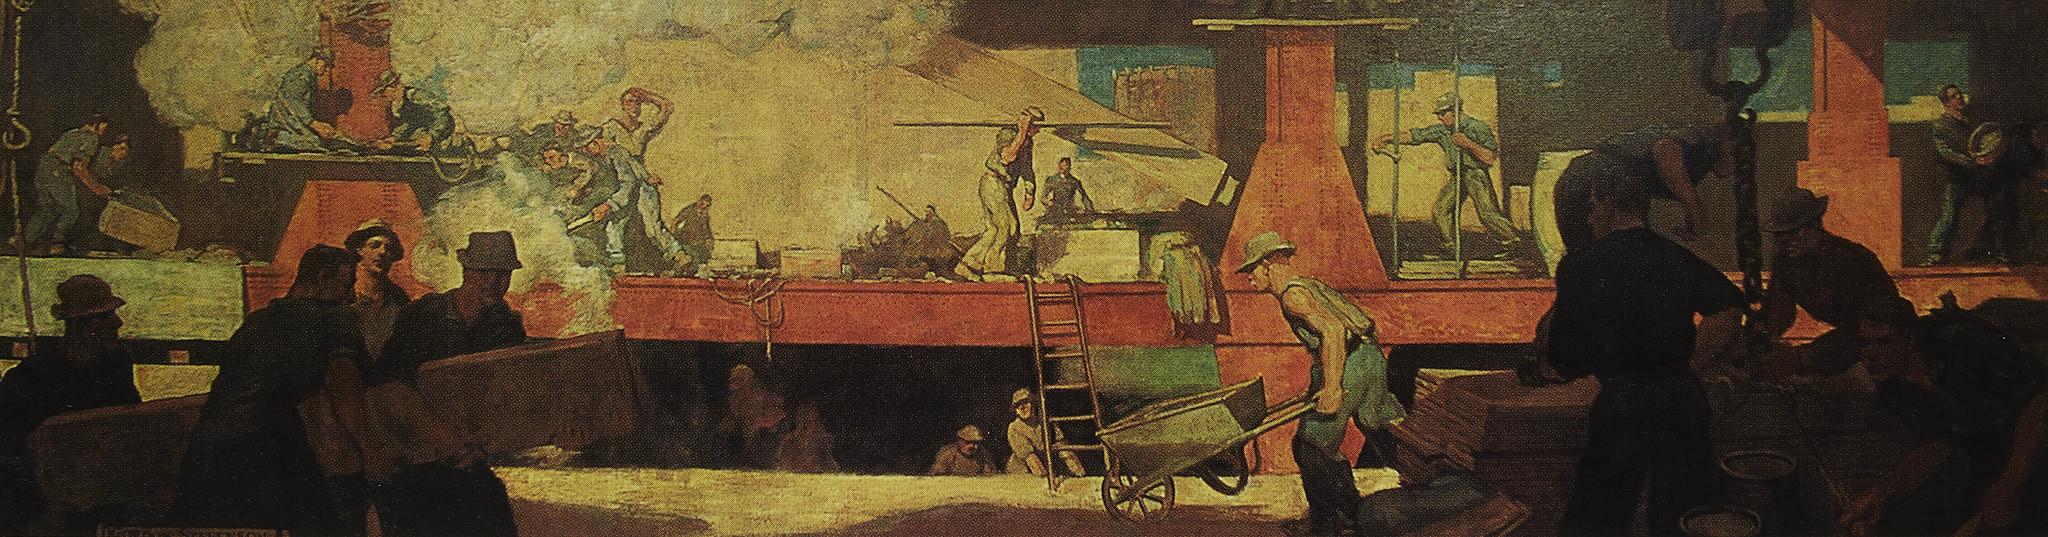 "Gordon Stevenson, Construction Site , 1909. Oil on canvas, 2 1/2""' x 15'."